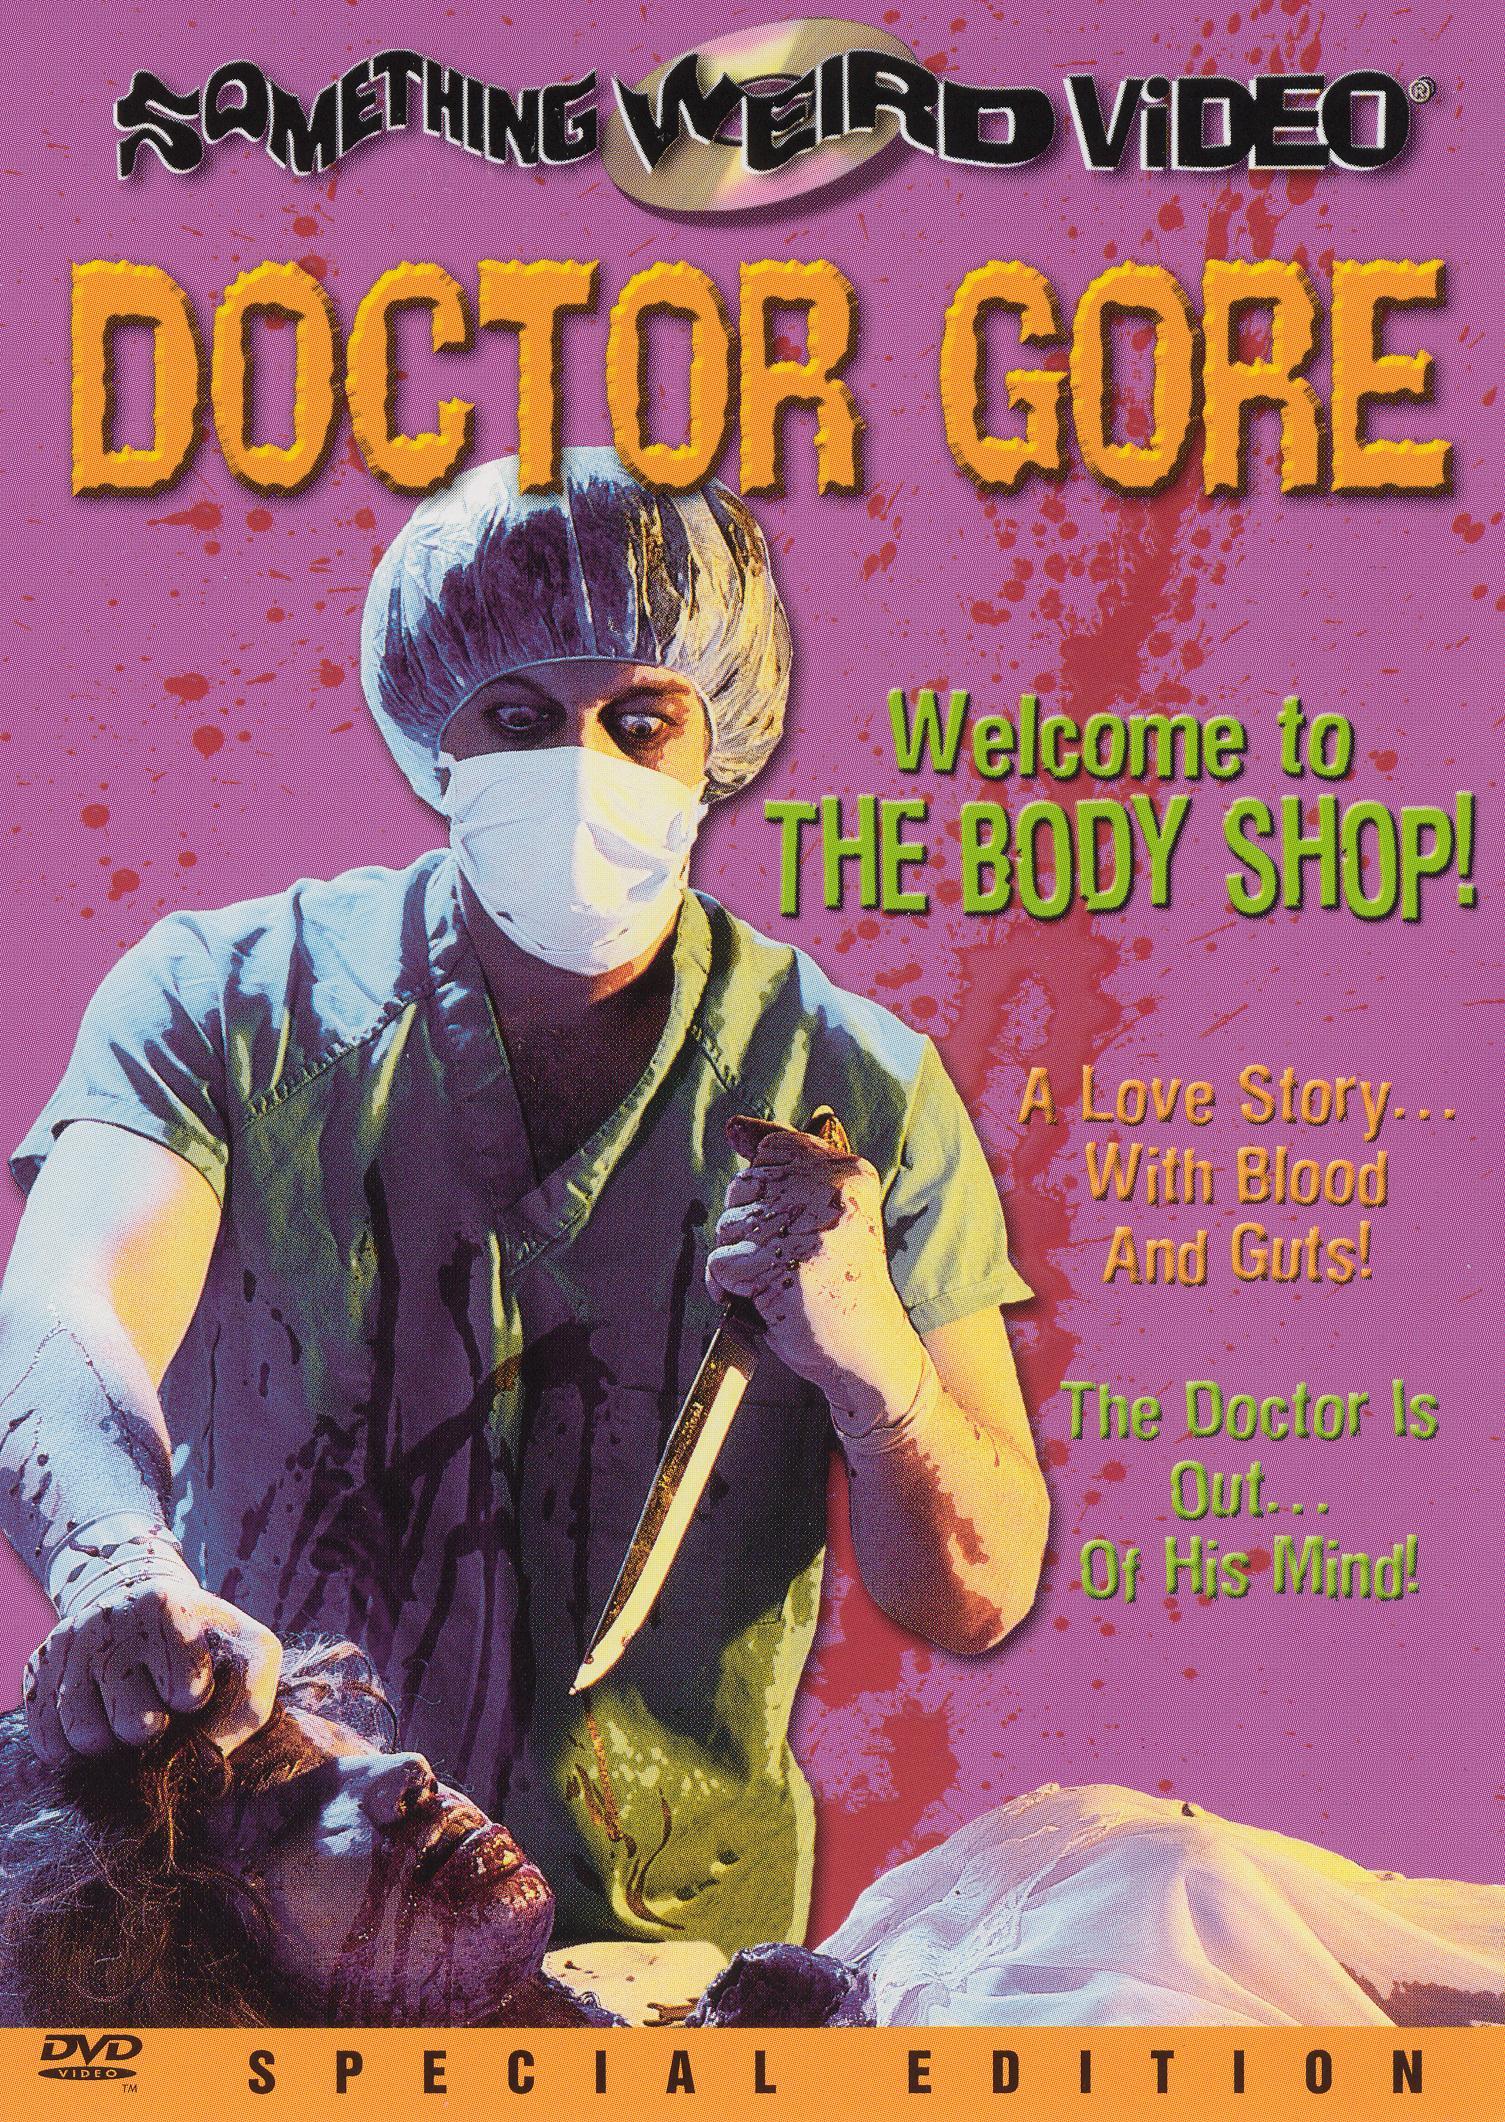 Doctor Gore